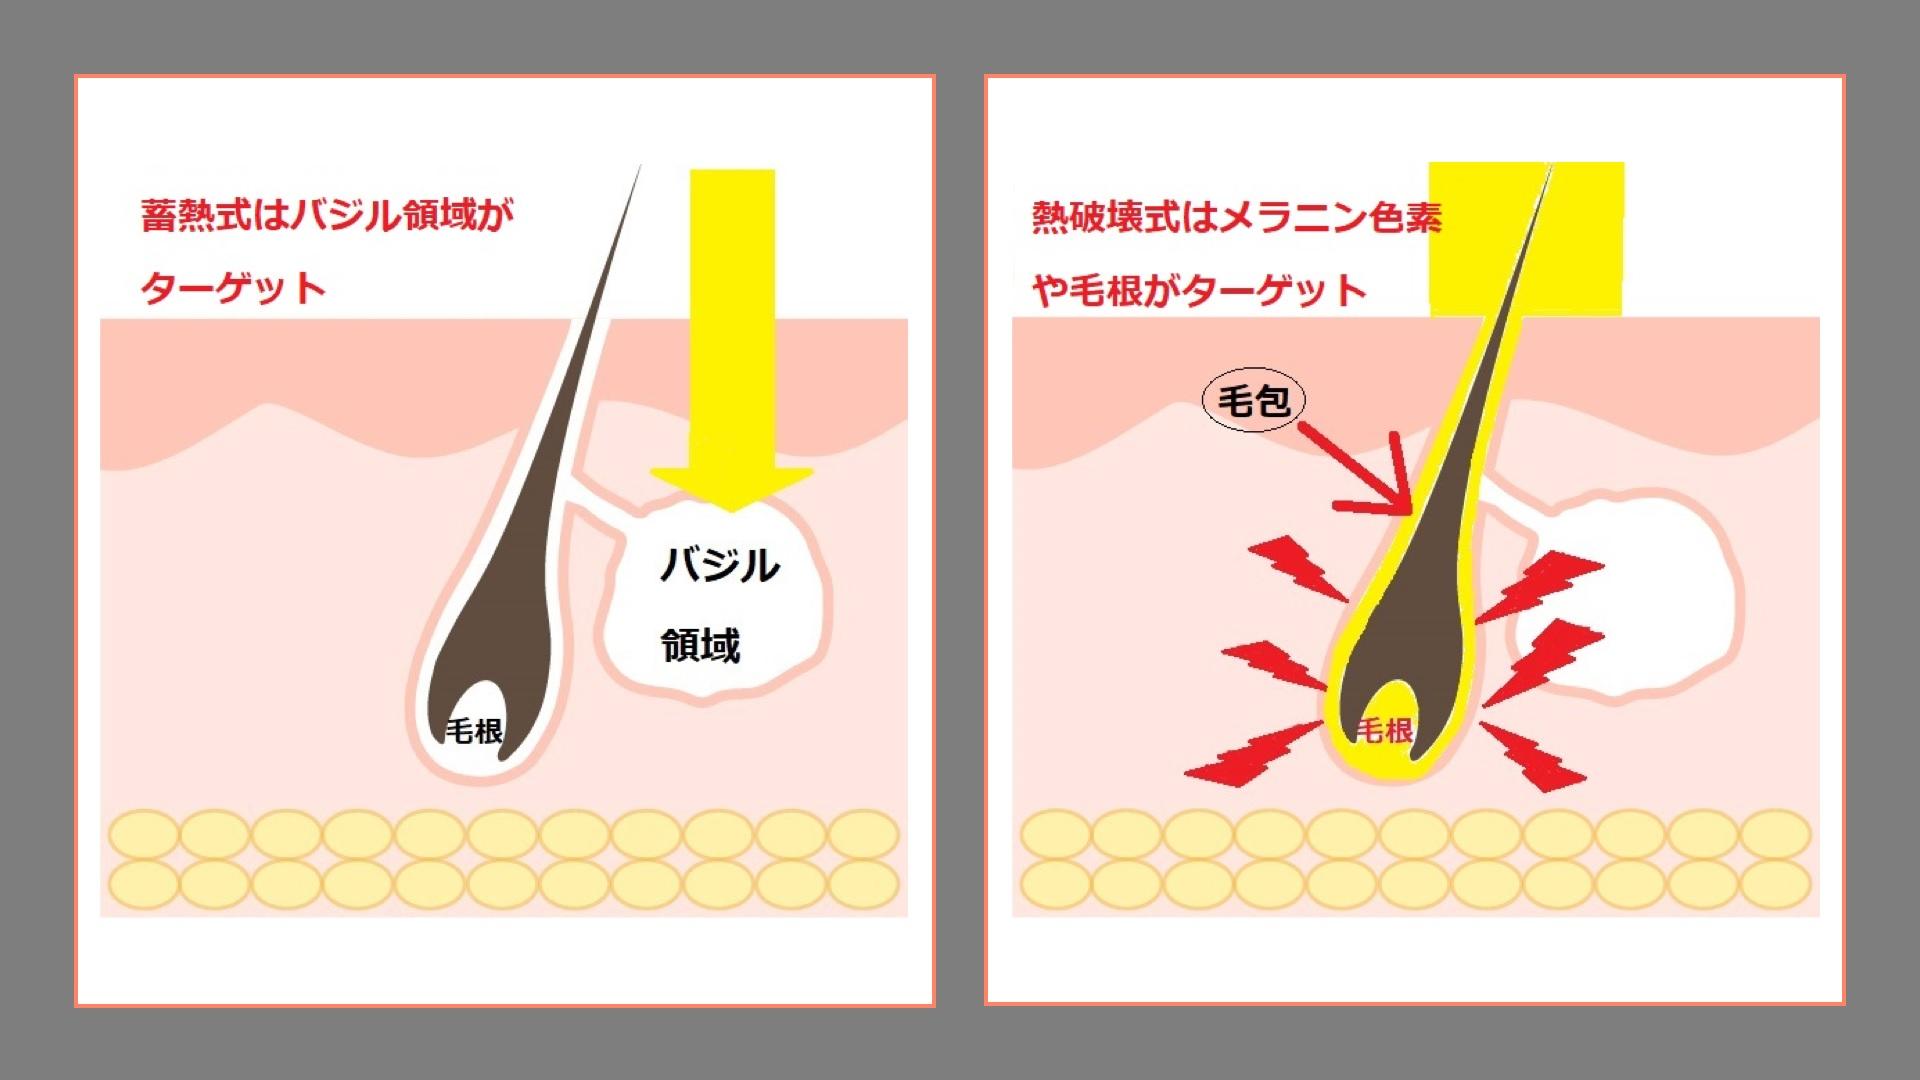 蓄熱式と熱破壊式(比較)